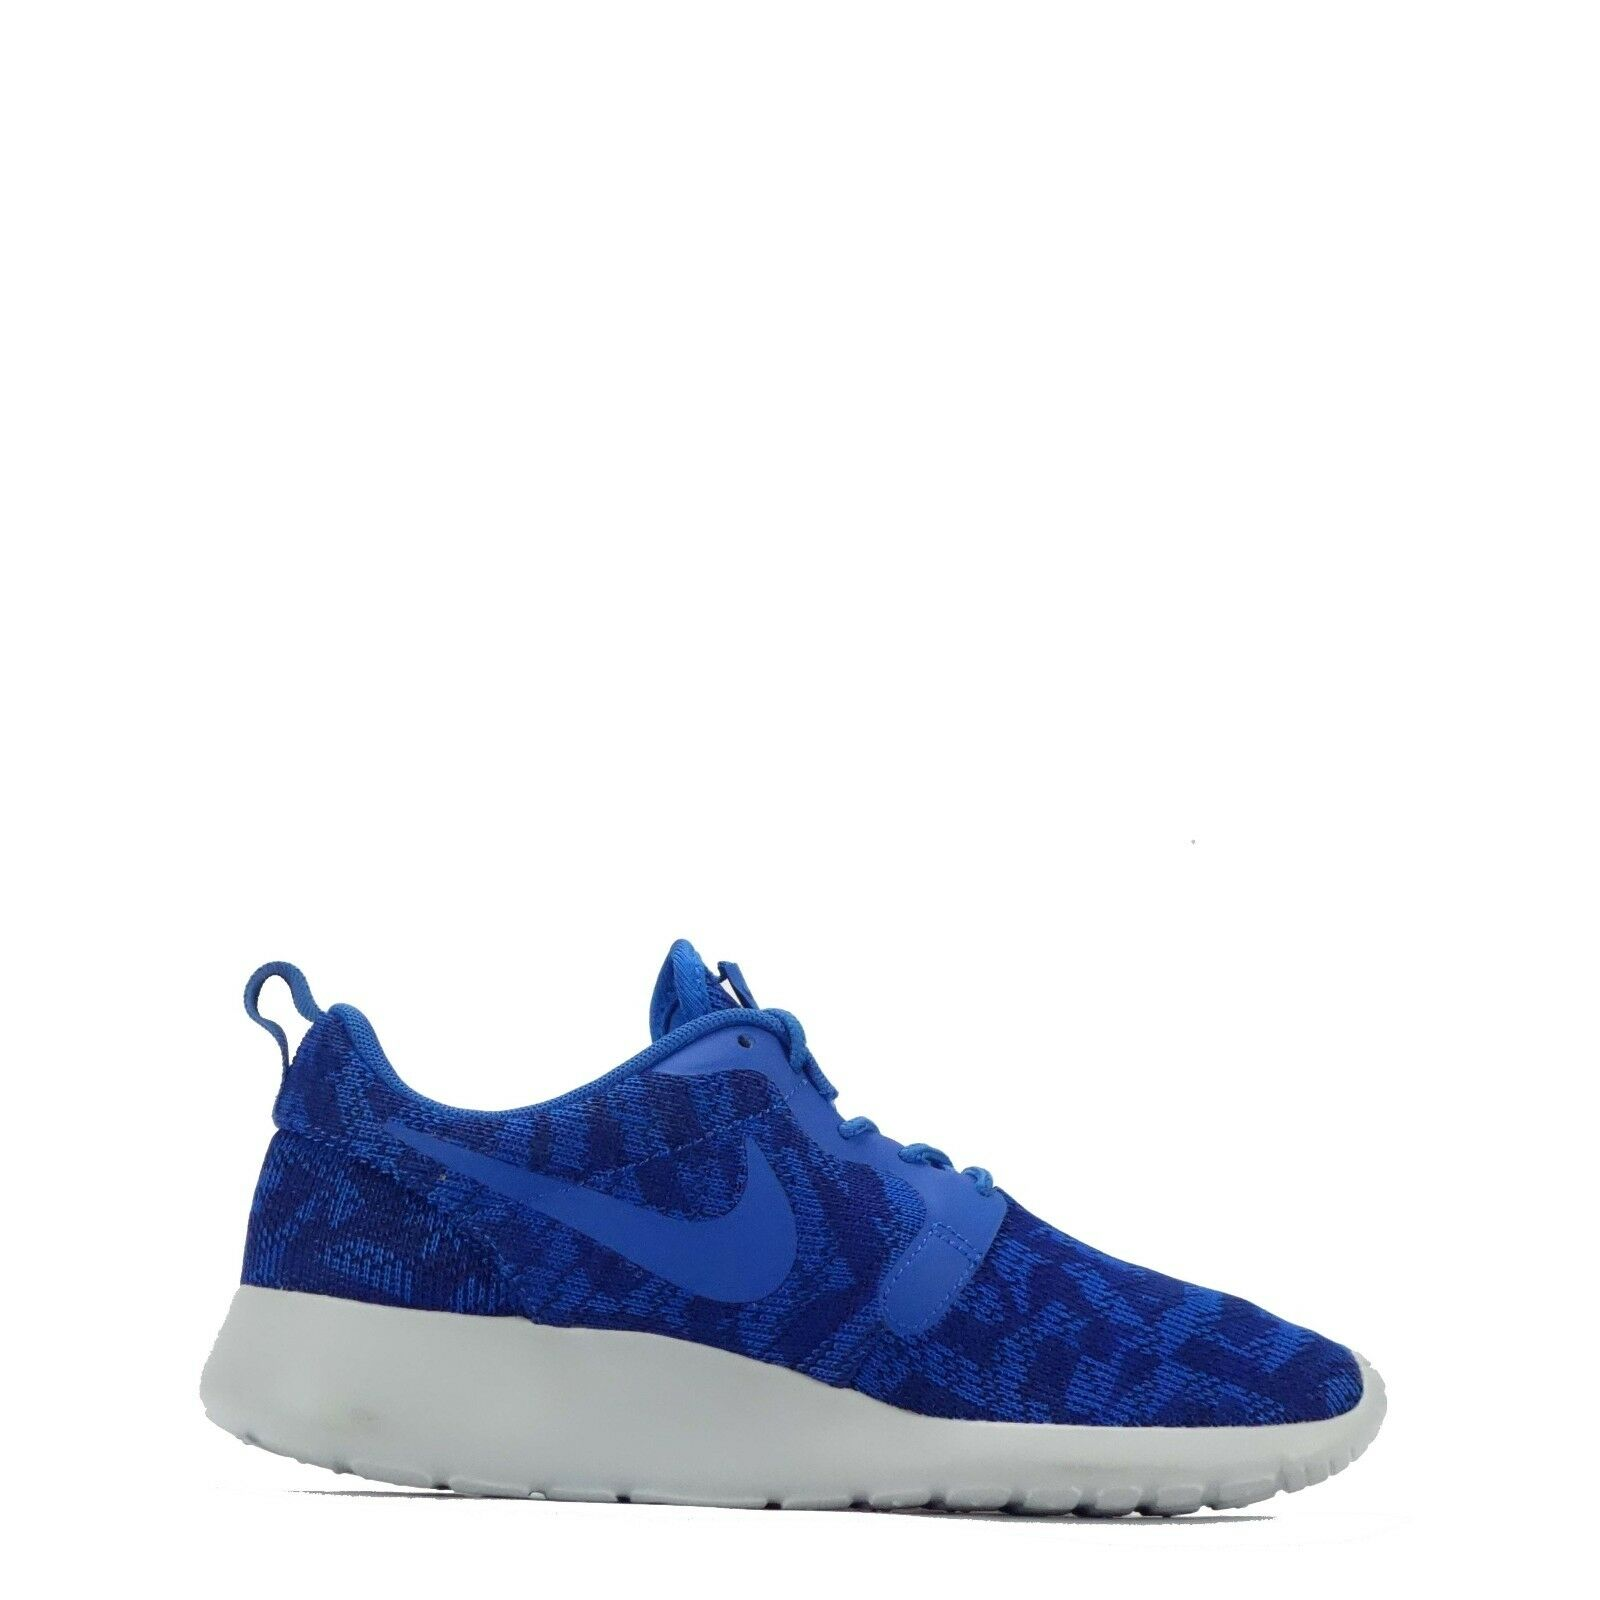 Nike Roshe Run One Jacquard Damen Turnschuhe Turnschuhe Turnschuhe Königsblau 3fb4ca